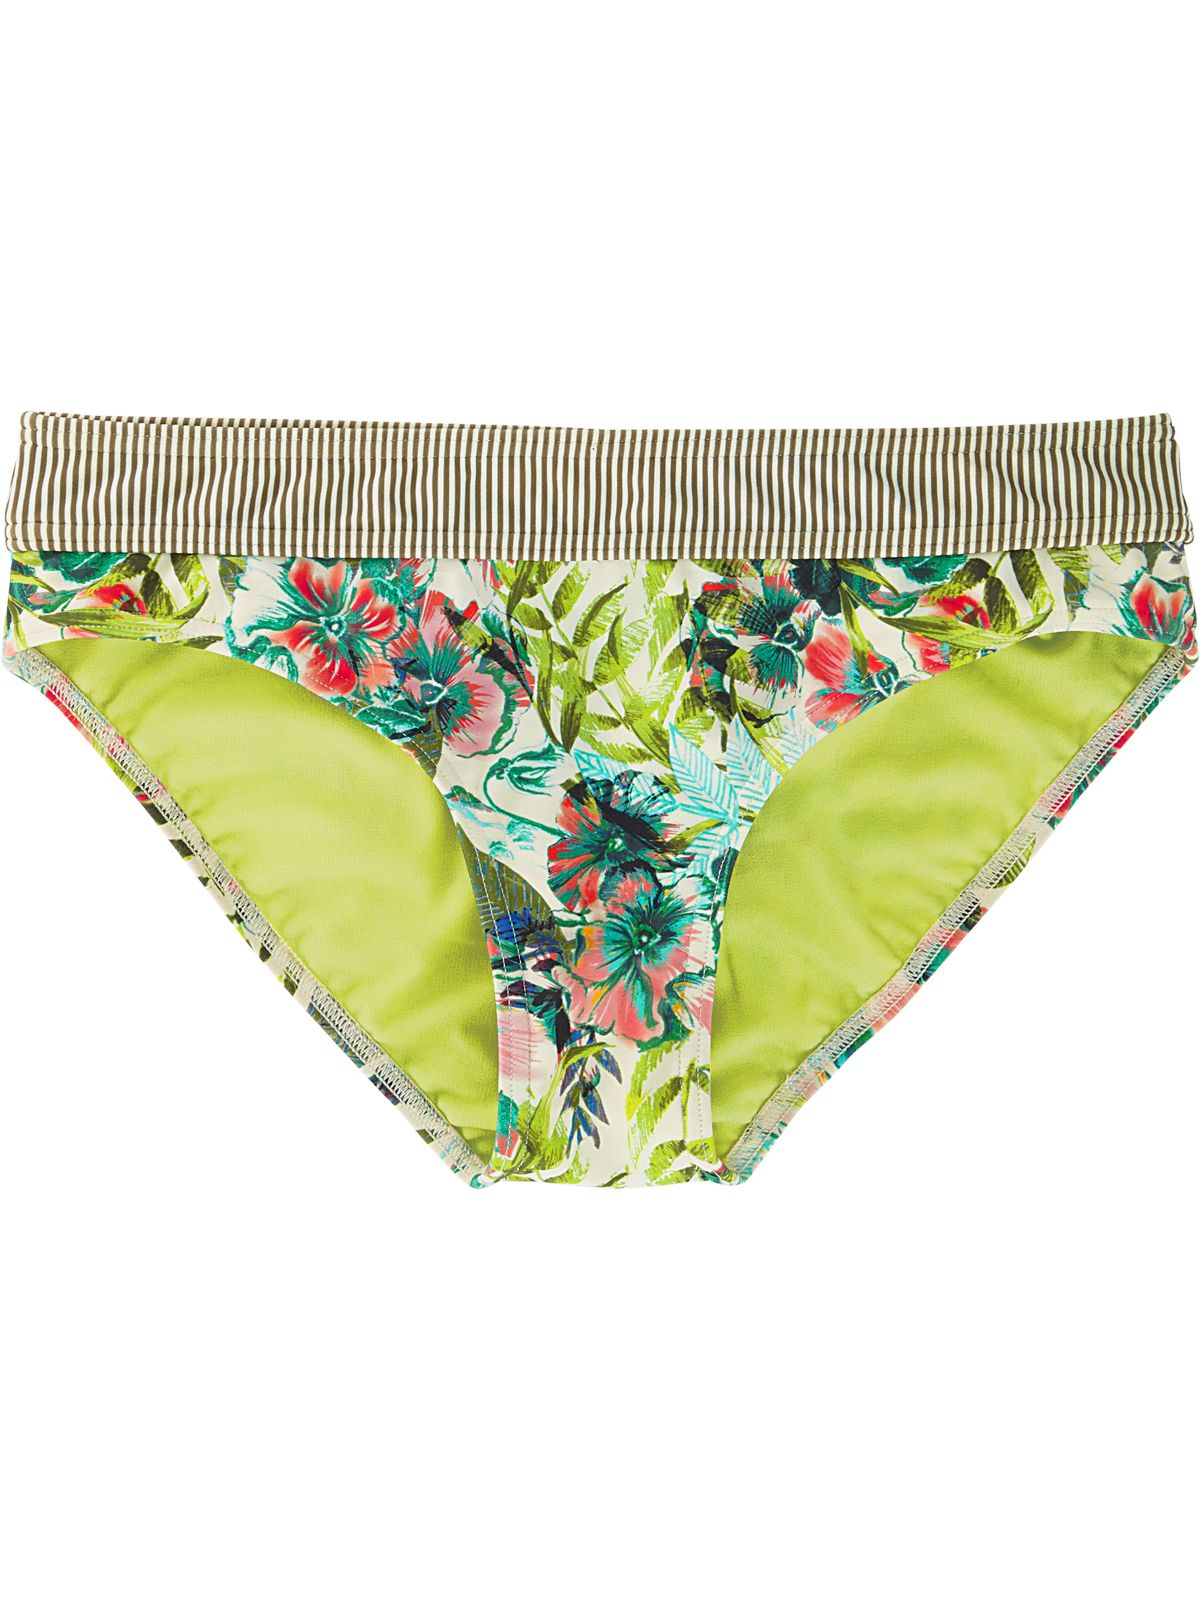 388b5ff63998 Ramba Swimsuit Bottom - Cargo Bali. Title Nine. T9. Active women's  swimwear. Active moms. Beach. Bikini bottoms. Flora. Pattern. Print. MId  rise.